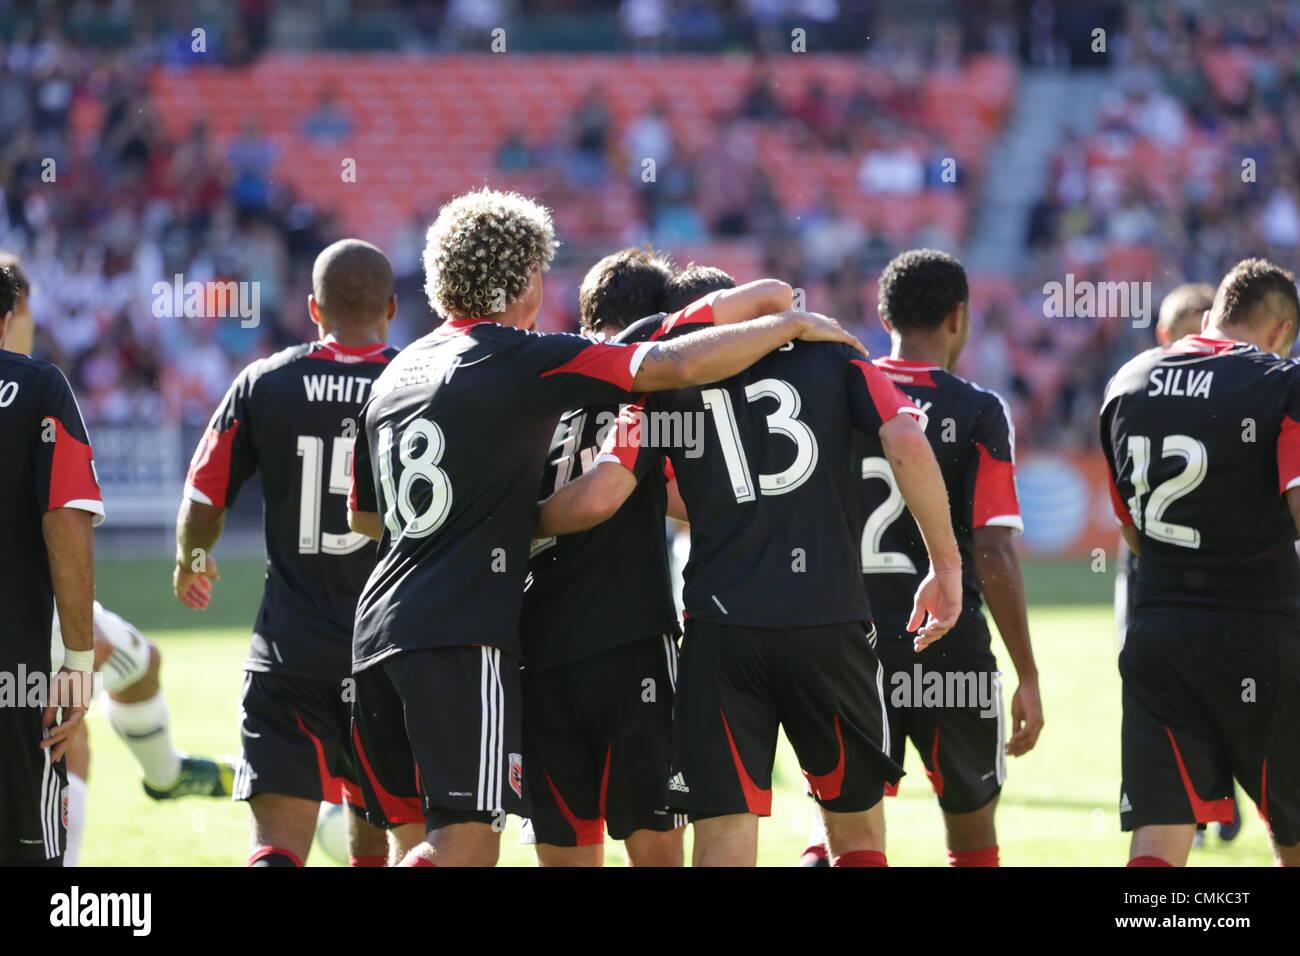 September 14, 2013, Washington D.C, DC United hosts LA Galaxy at RFK. DC United ties LA Galaxy 2-2. Pontius celebrates - Stock Image